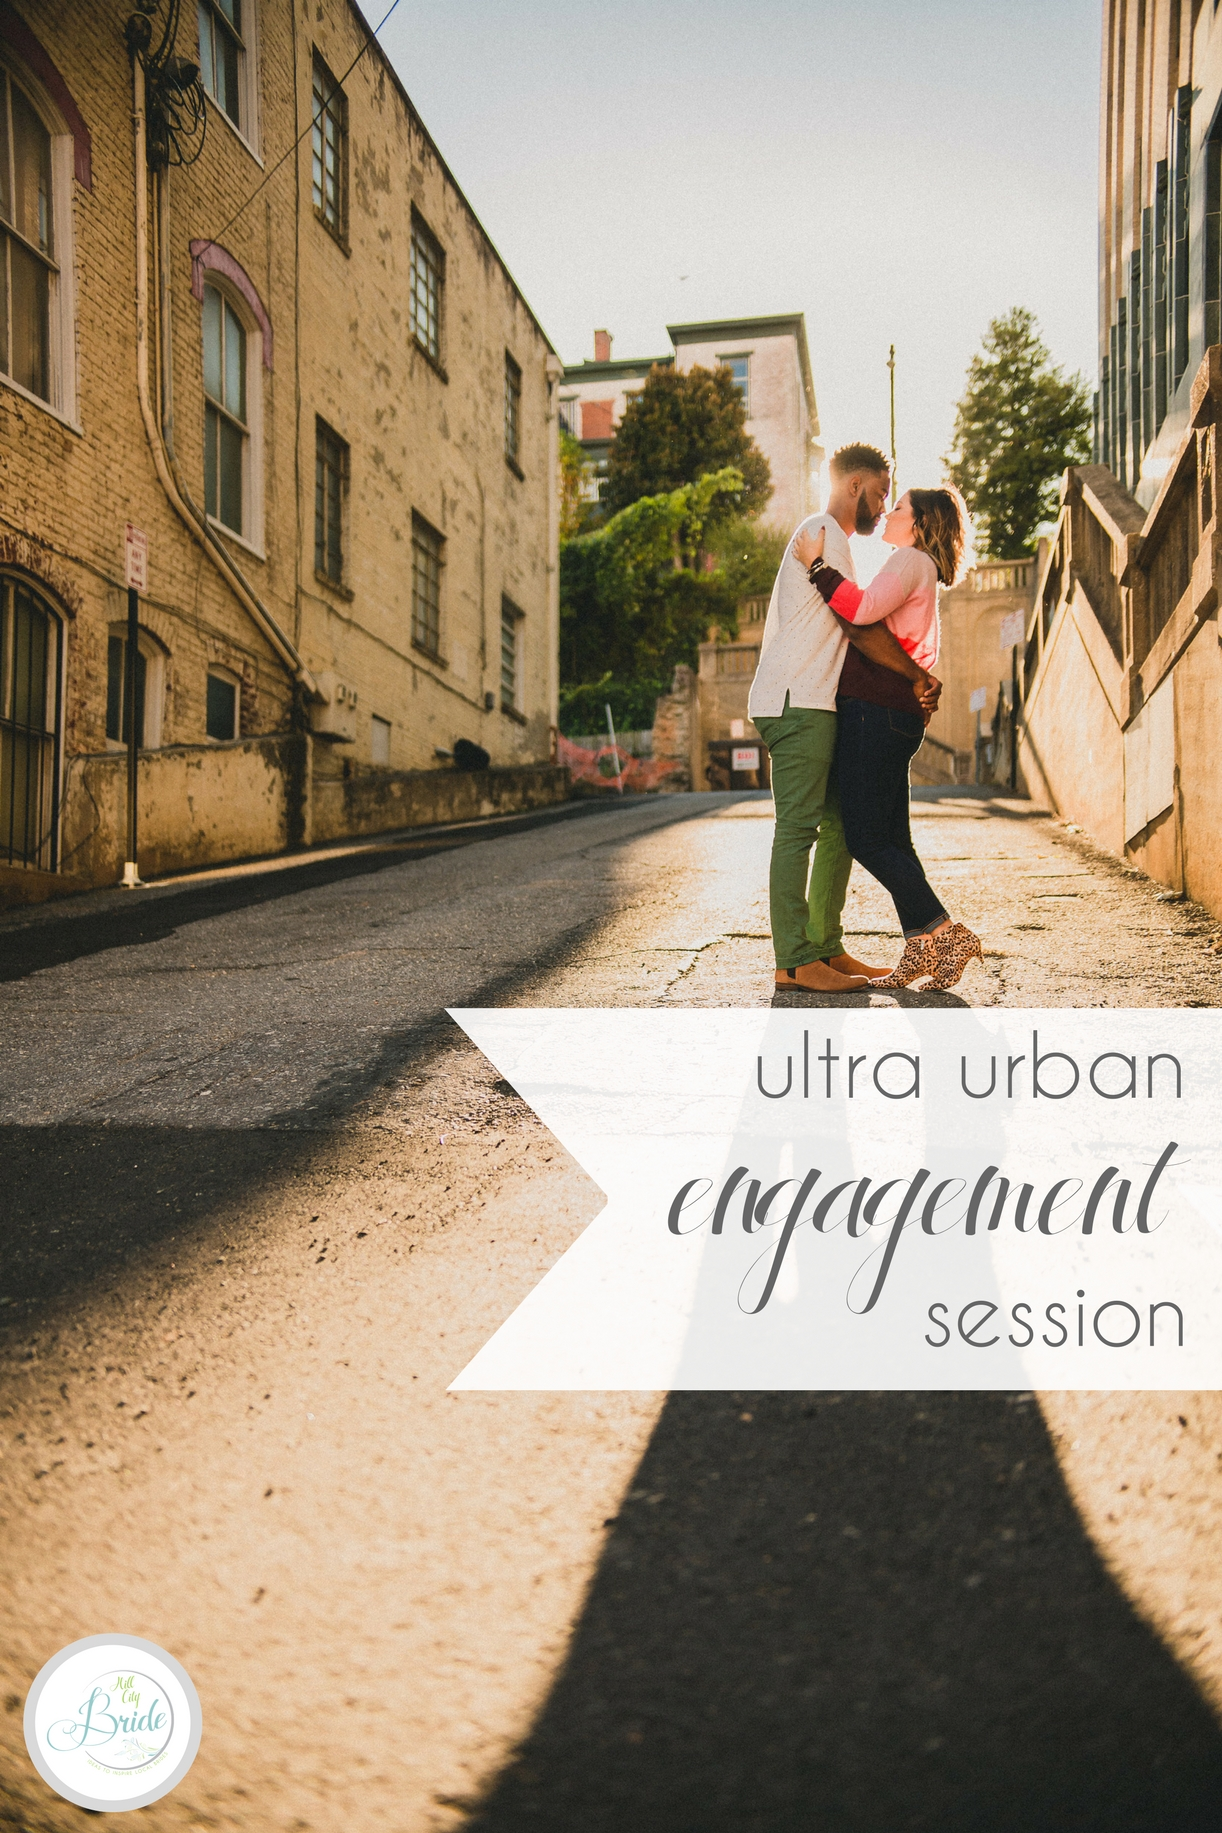 Ultra Urban Engagement Session in Lynchburg Virginia | Hill City Bride Wedding Blog